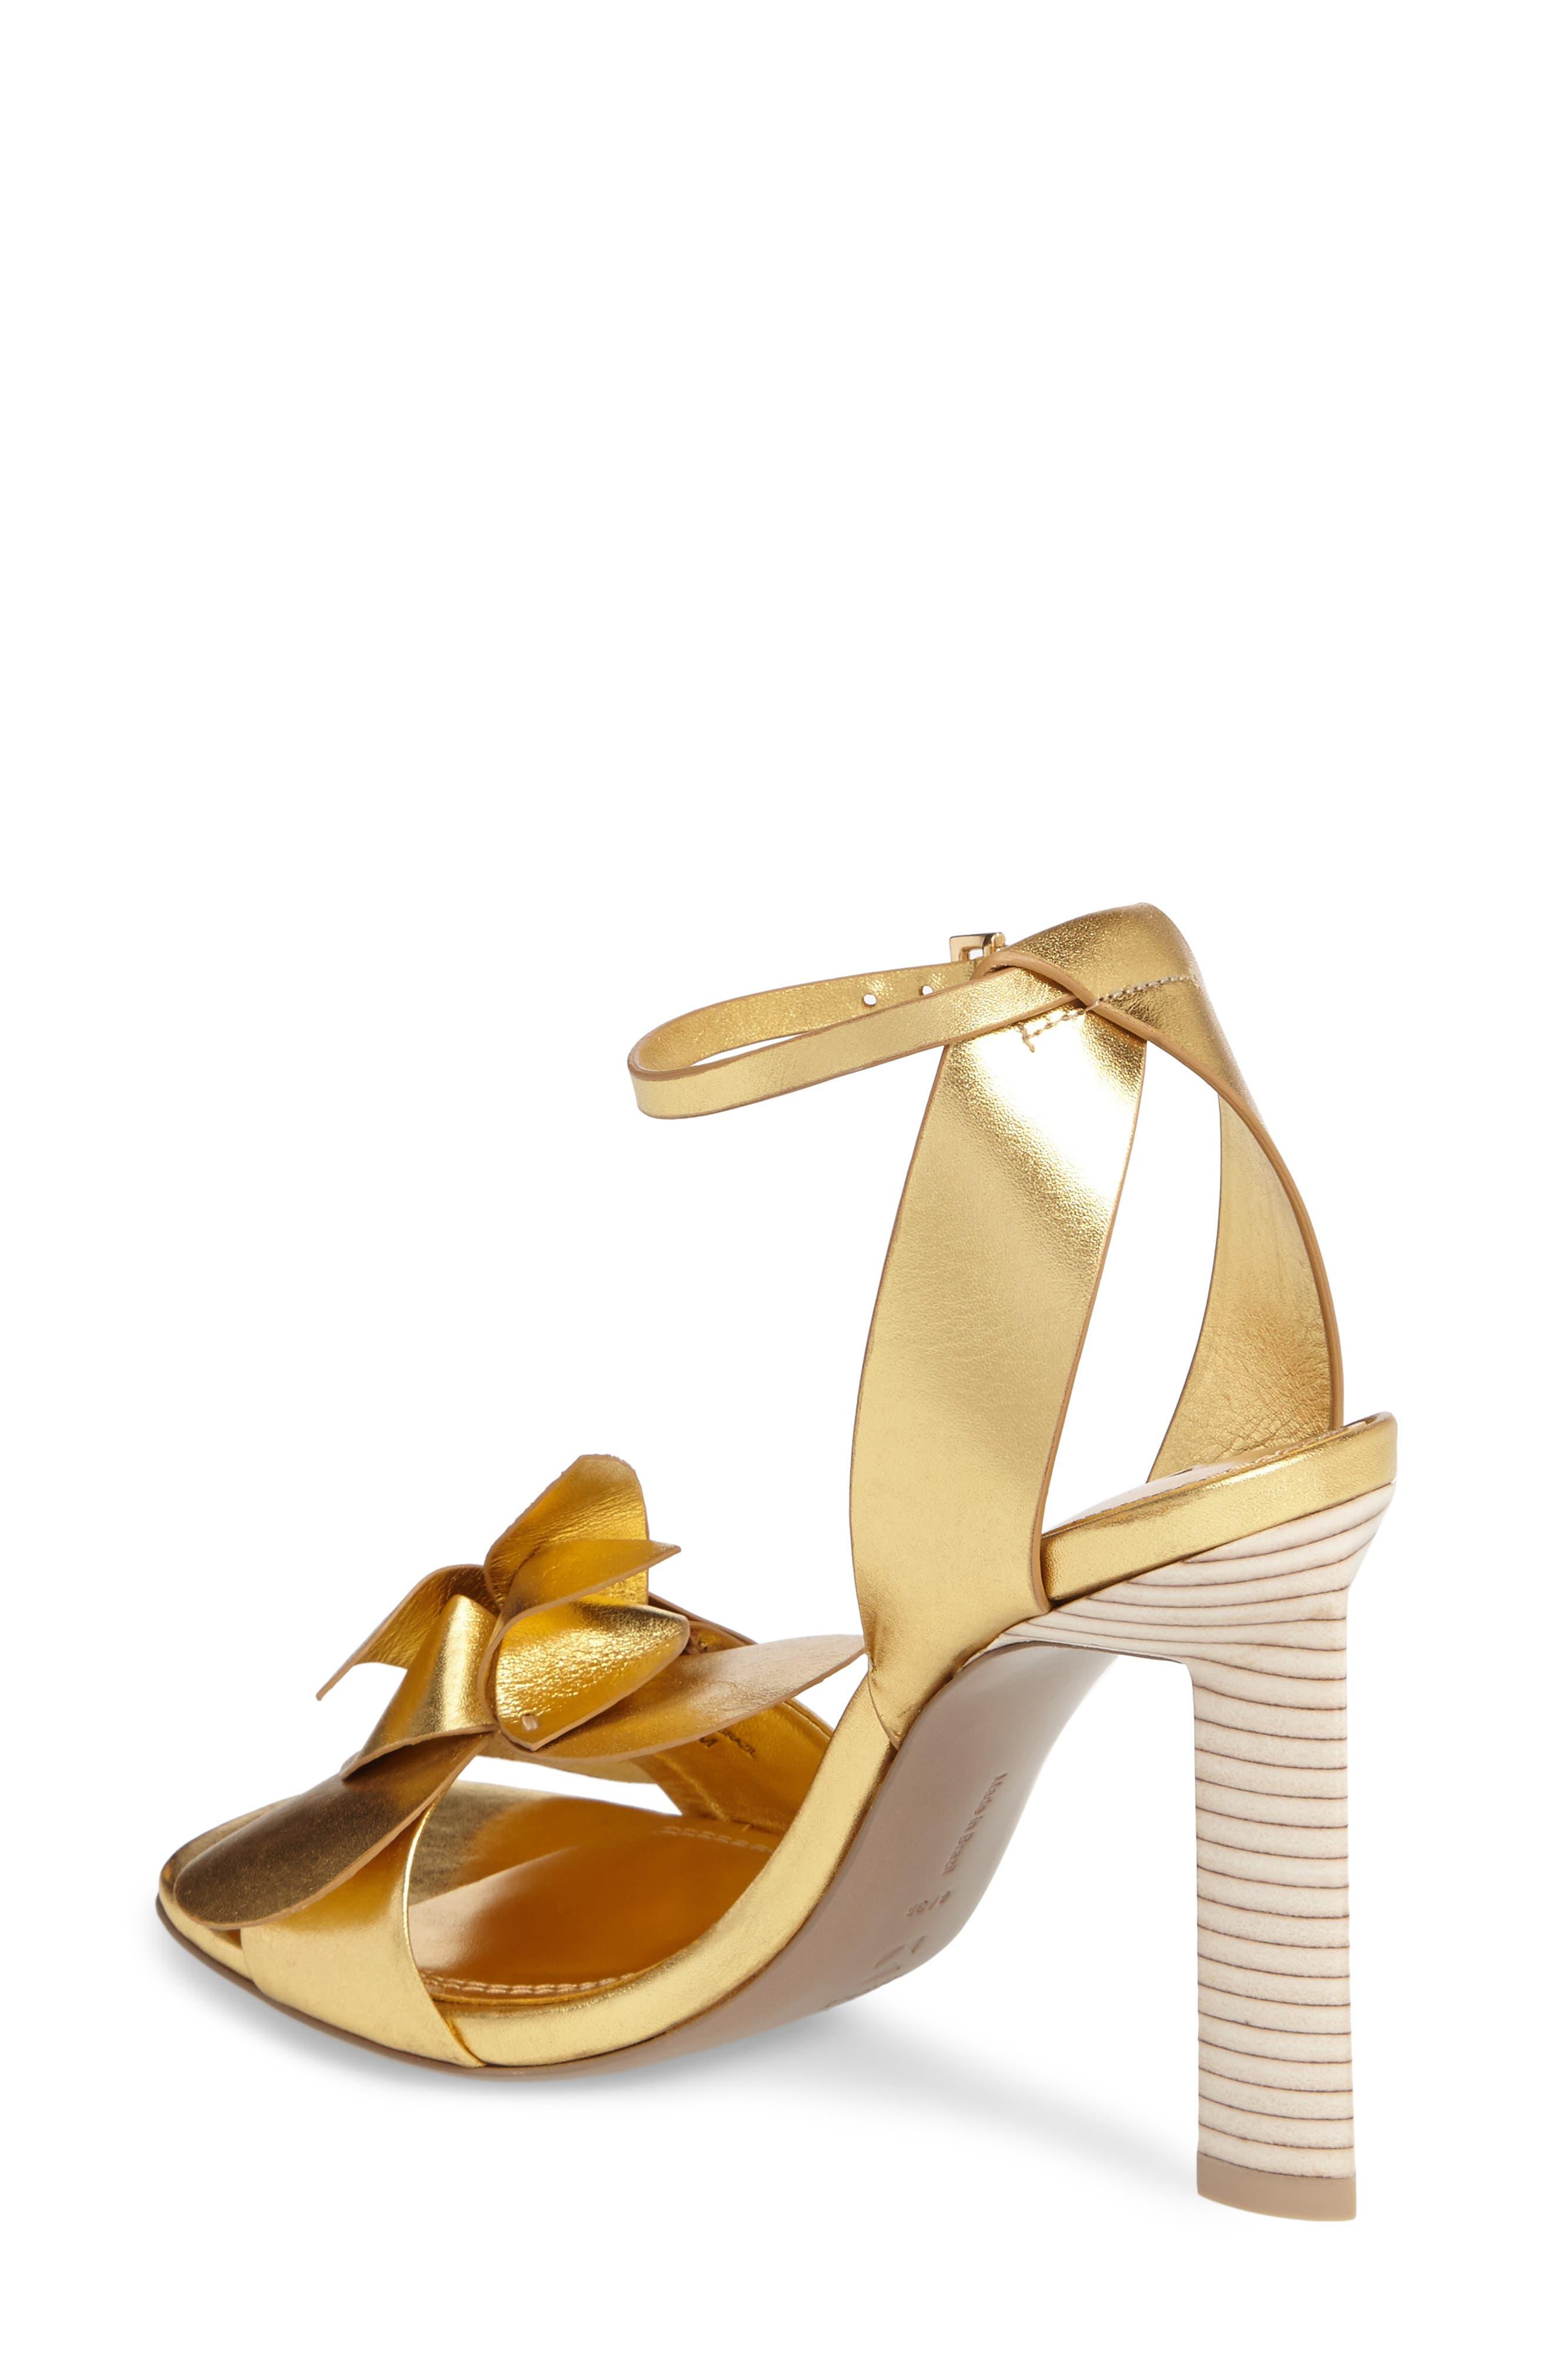 Tealia Sandal,                             Alternate thumbnail 3, color,                             Gold Leather